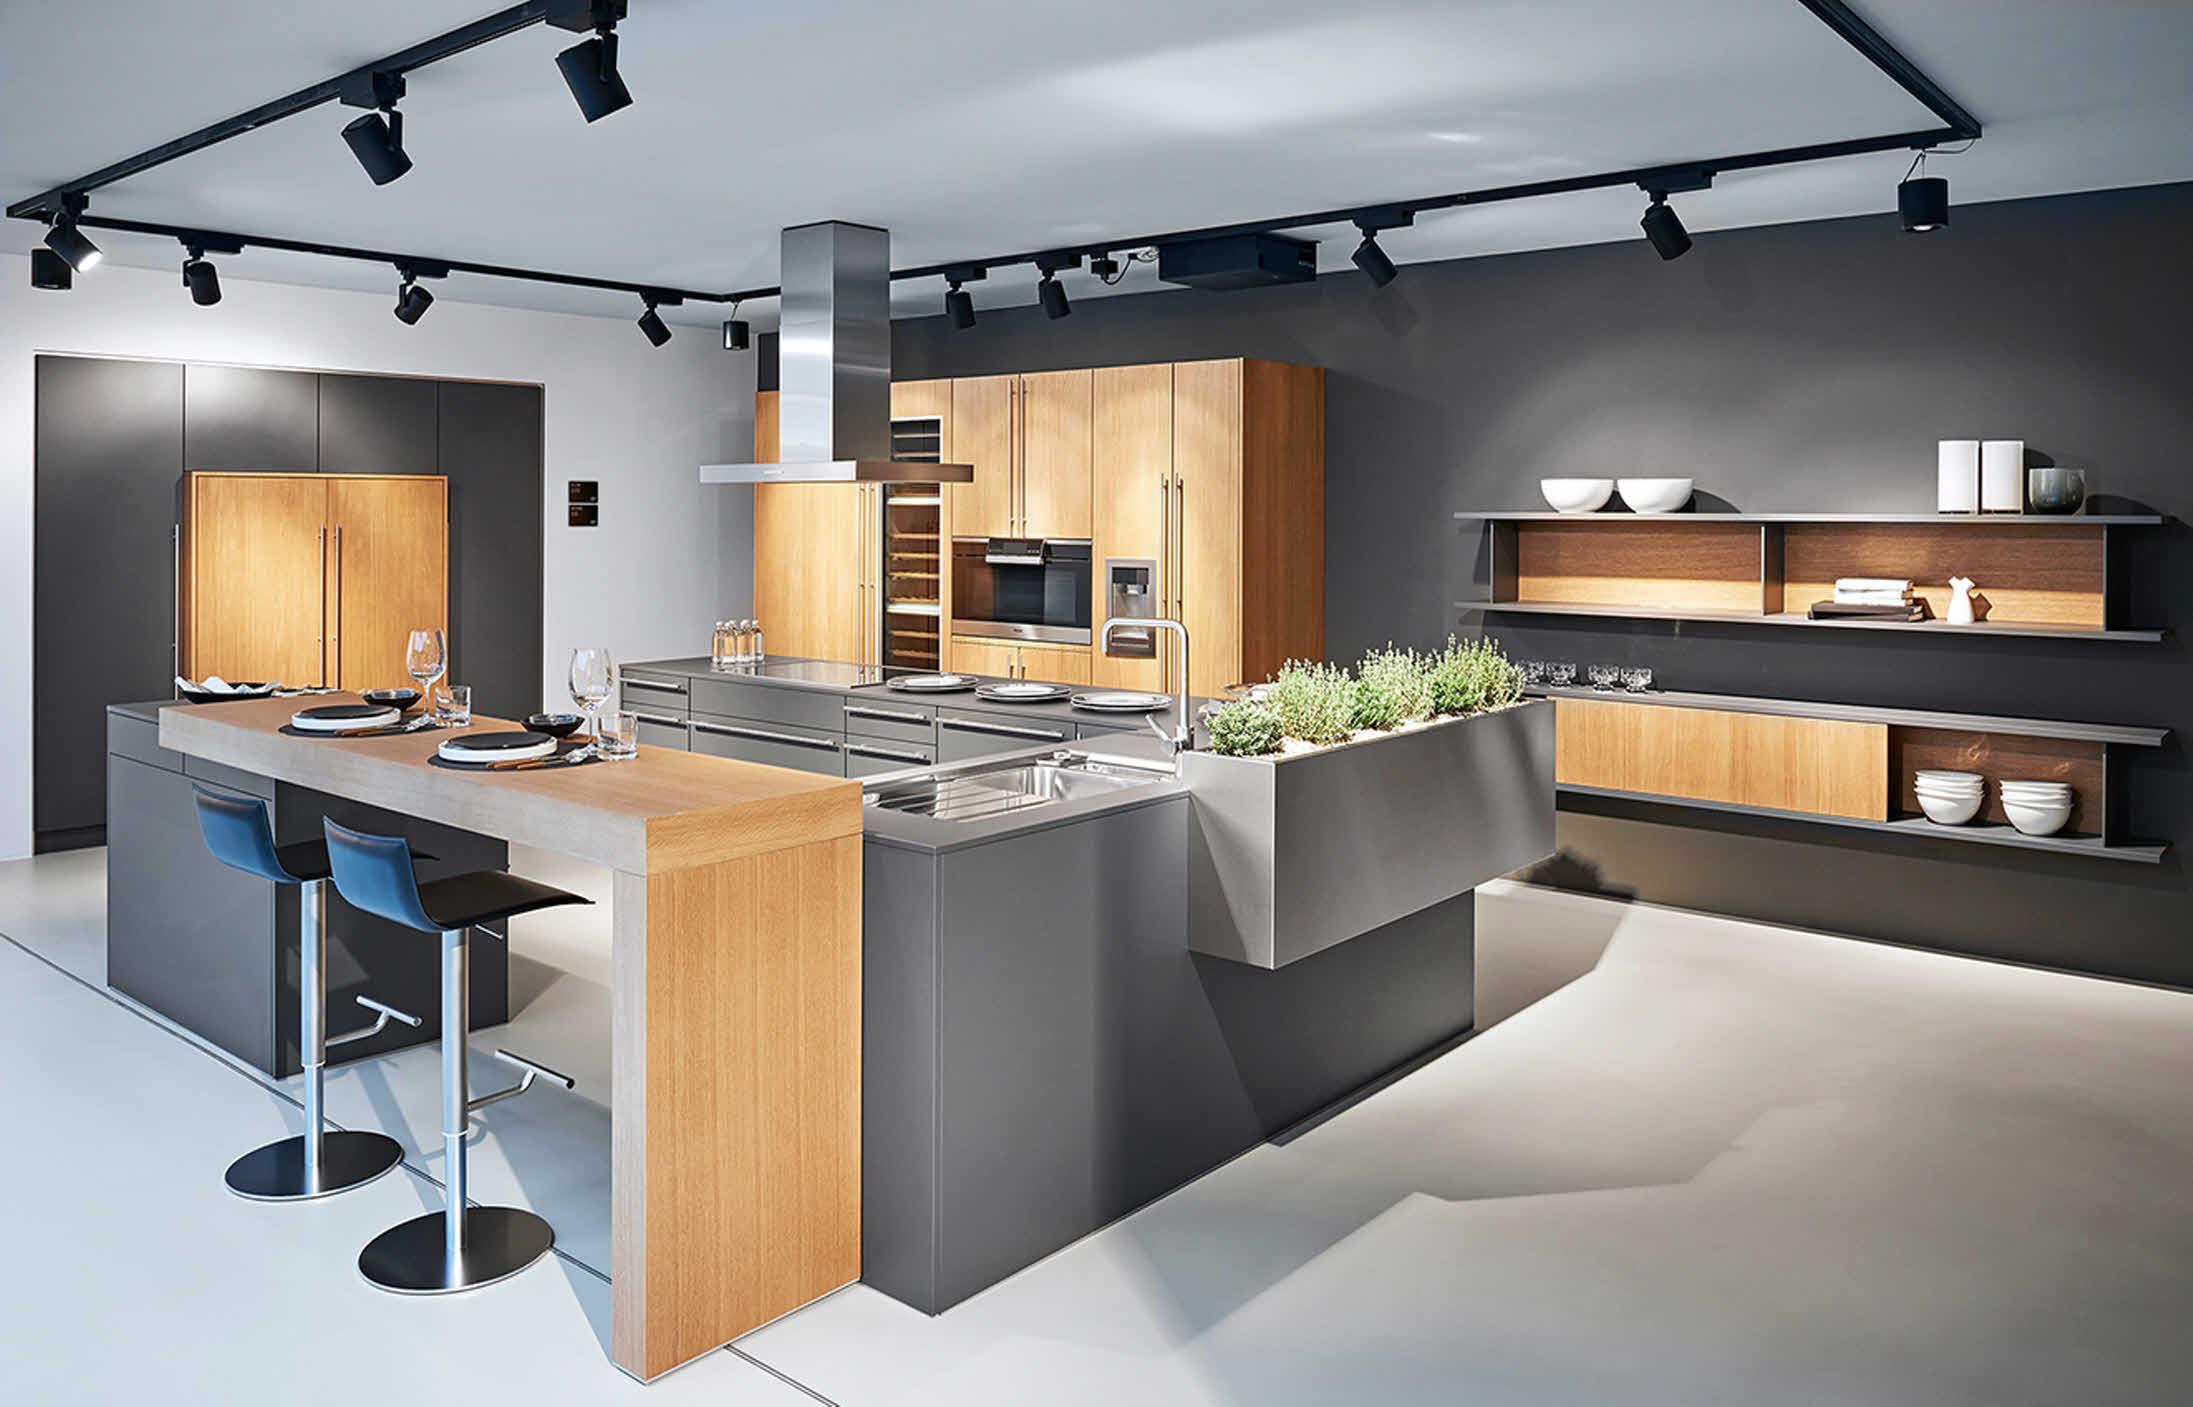 Poggenpohl new showroom - The Kitchen and Bathroom Blog